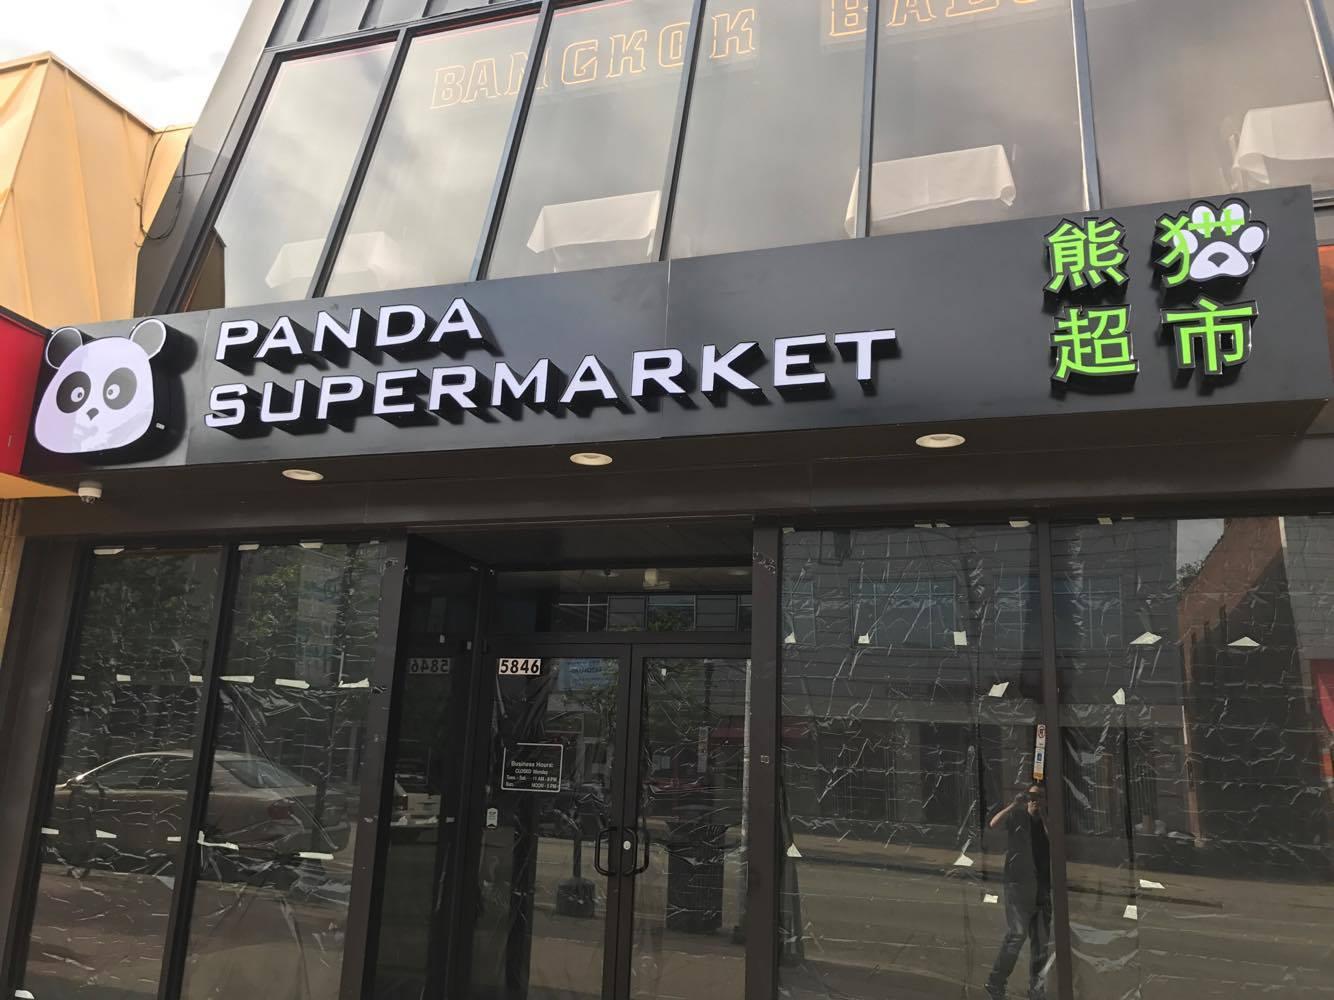 Pennsylvasia Squirrel Hill S Panda Supermarket dž�猫超市